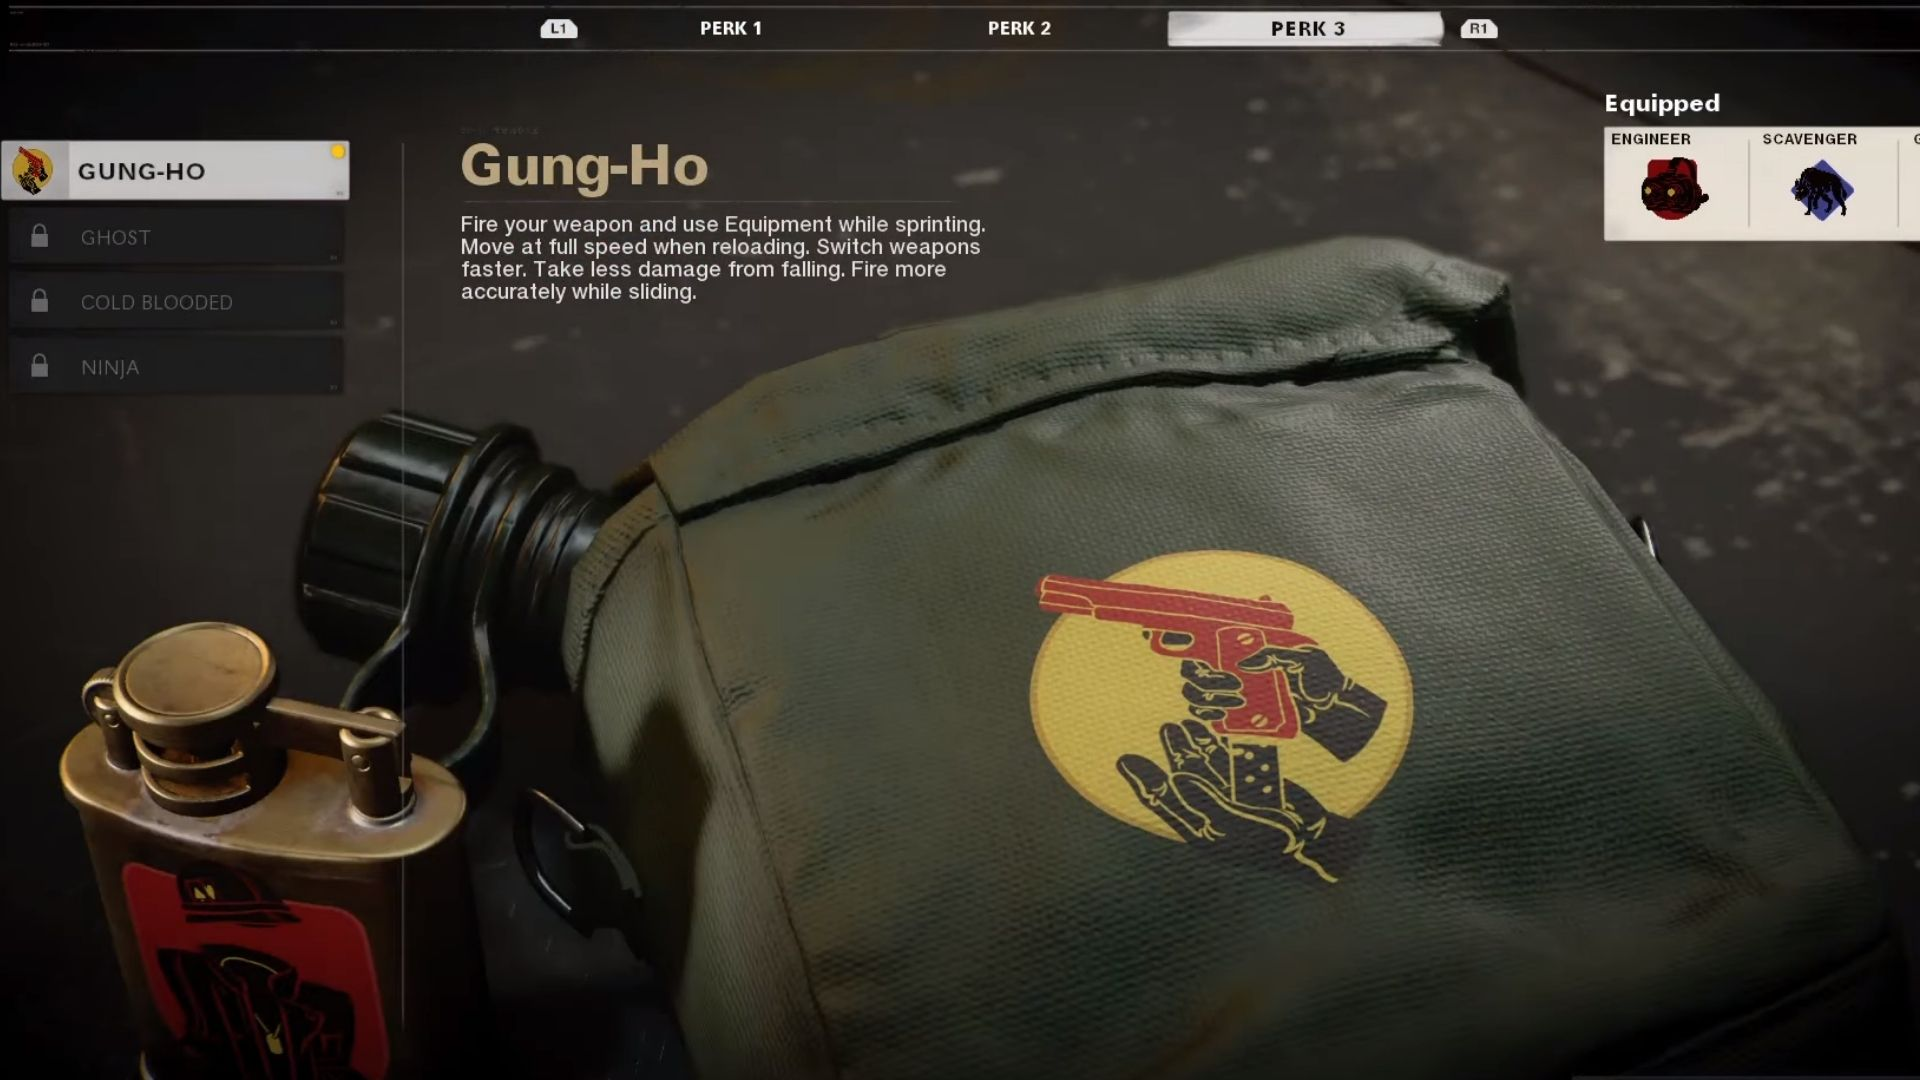 Gung-go perk in black ops cold war